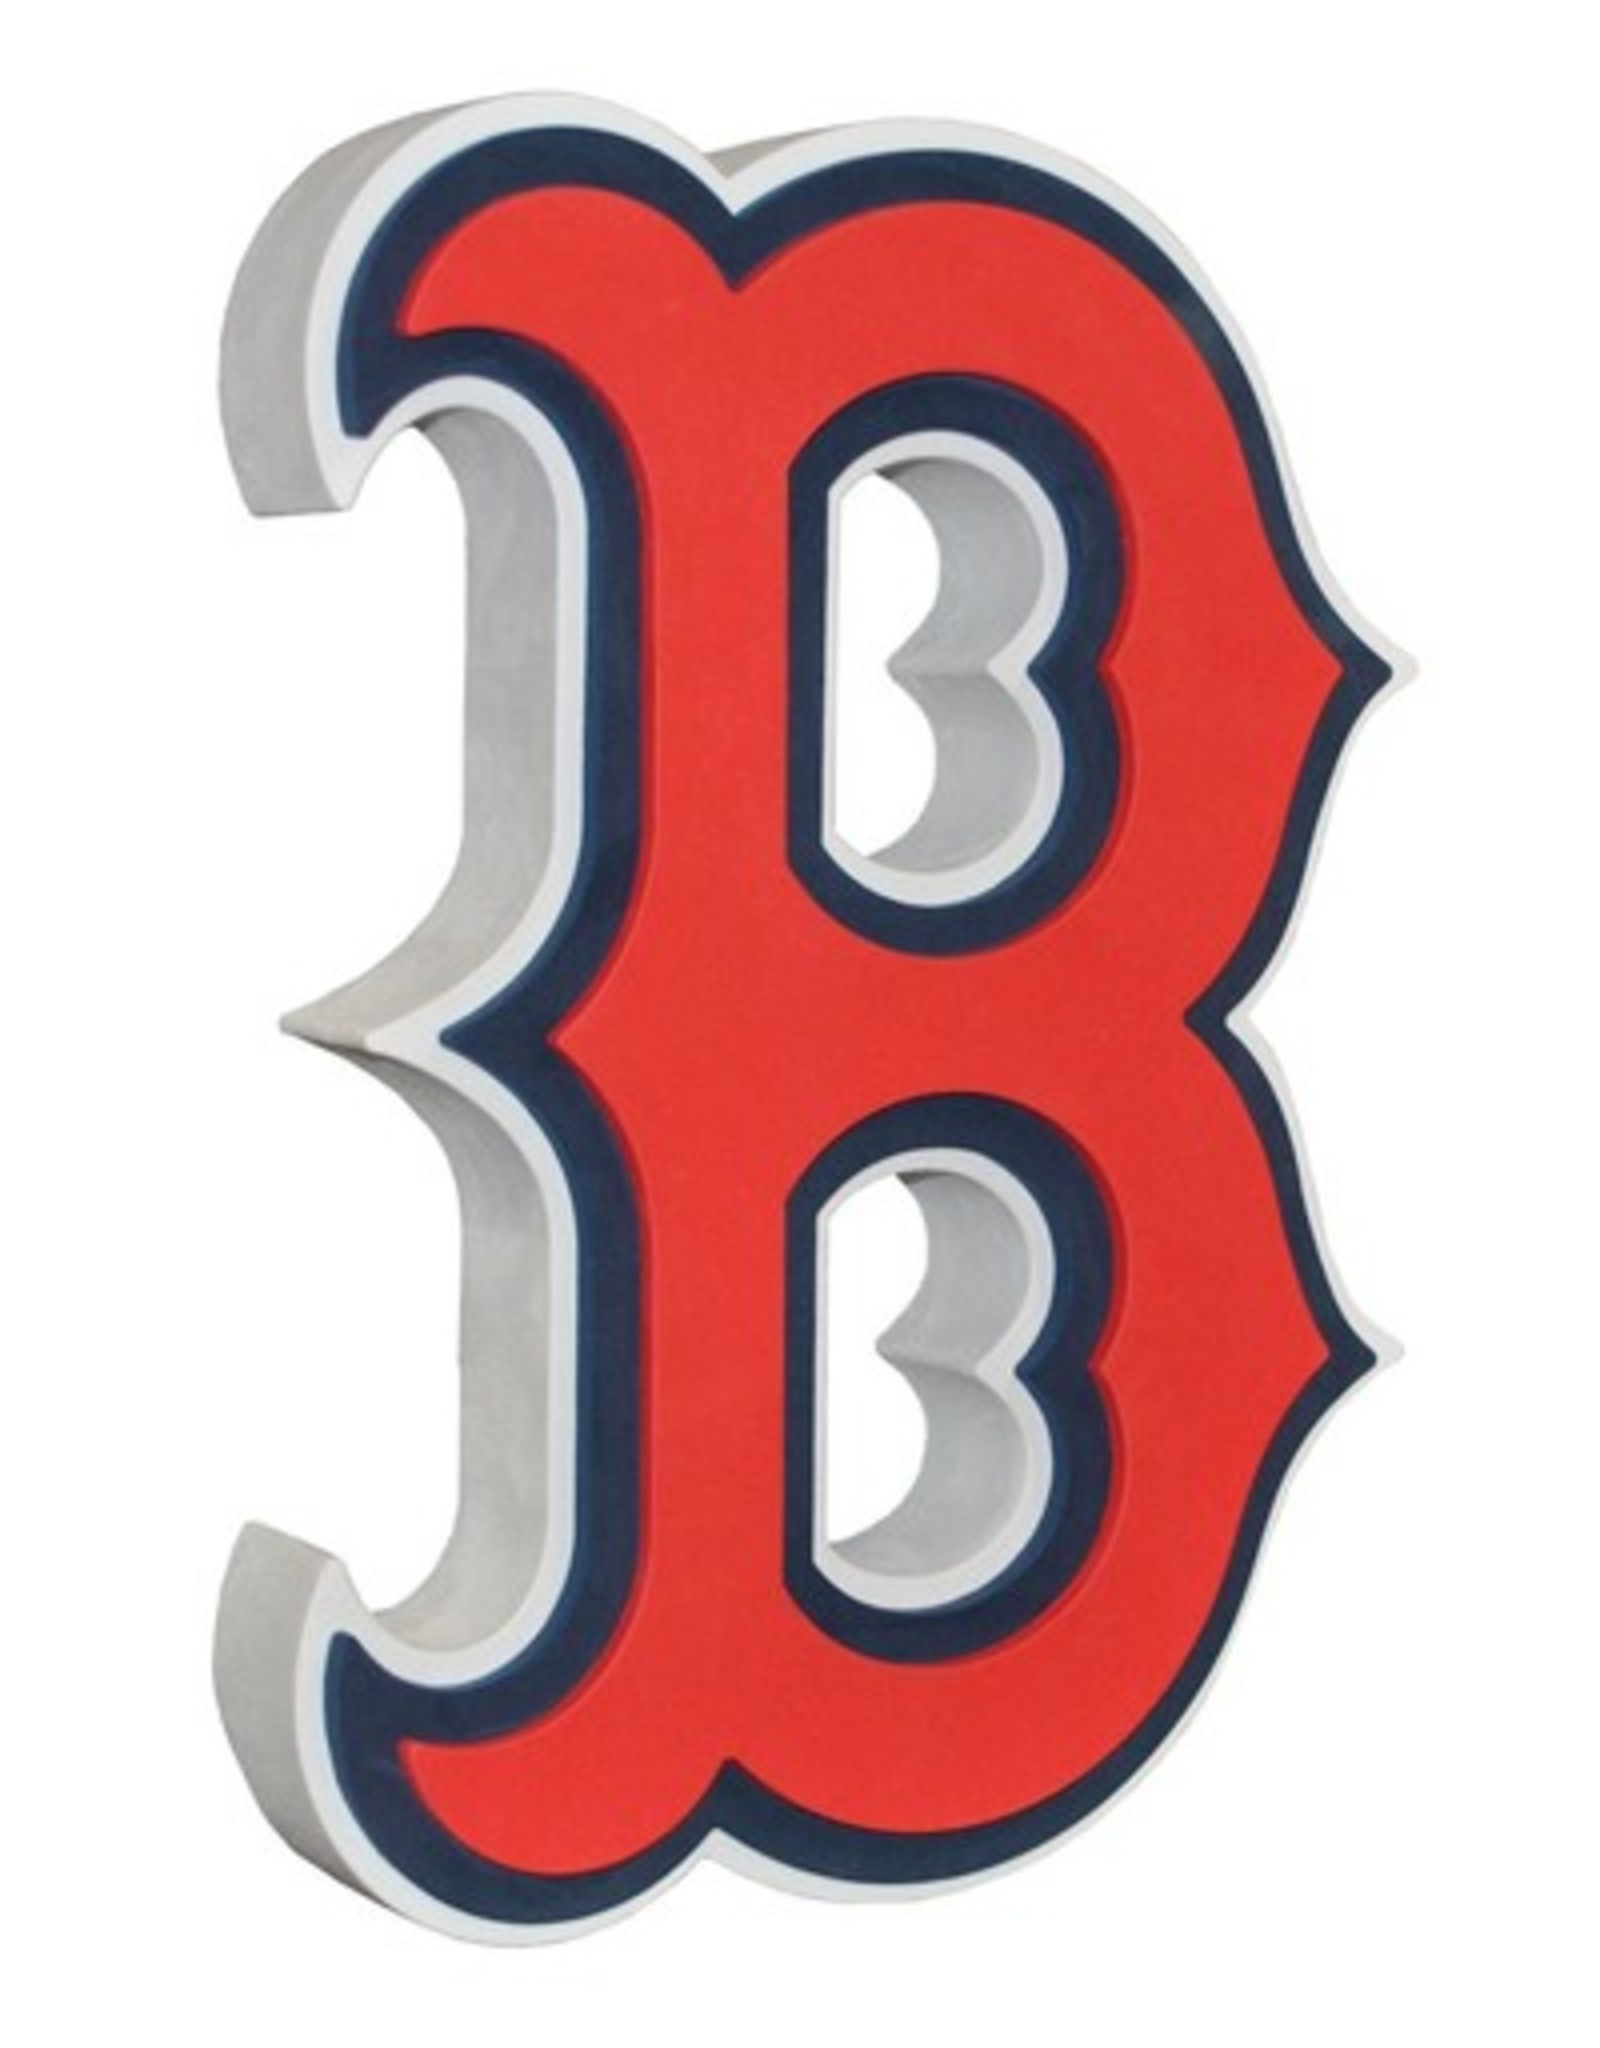 Boston Red Sox 3D Foam Logo Sign - B Logo